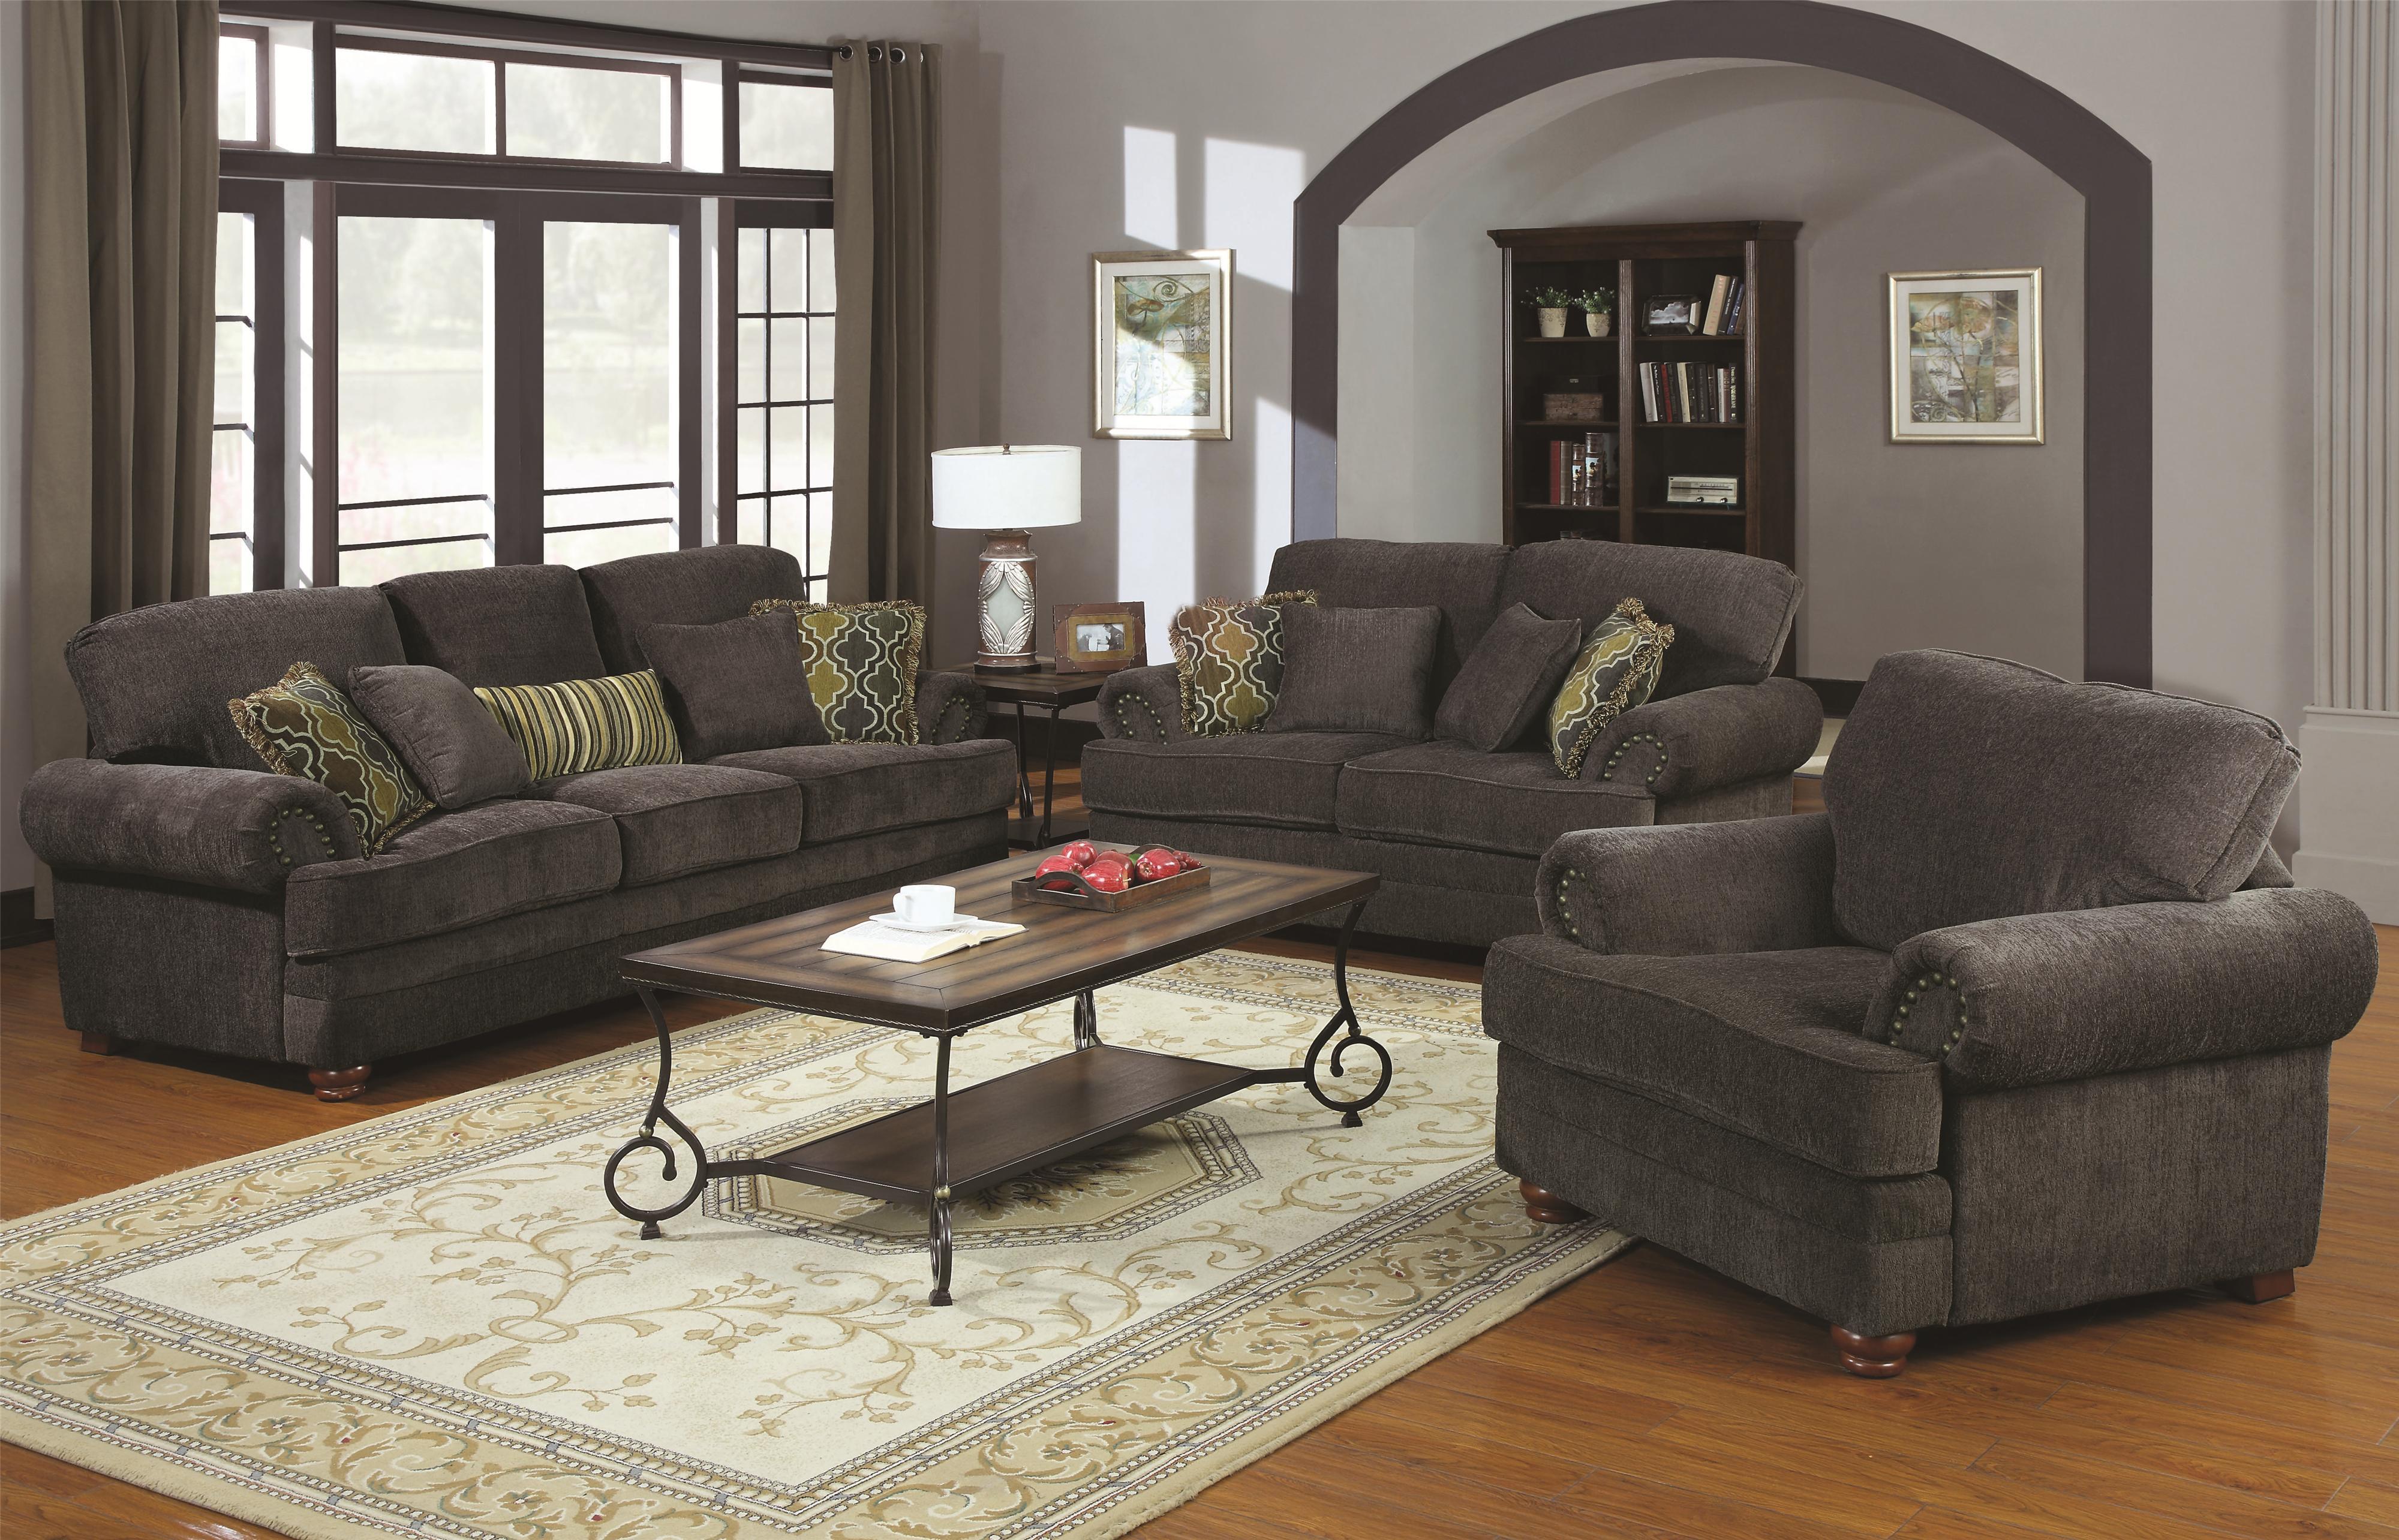 Coaster Colton Traditional Sofa with Elegant Design Style